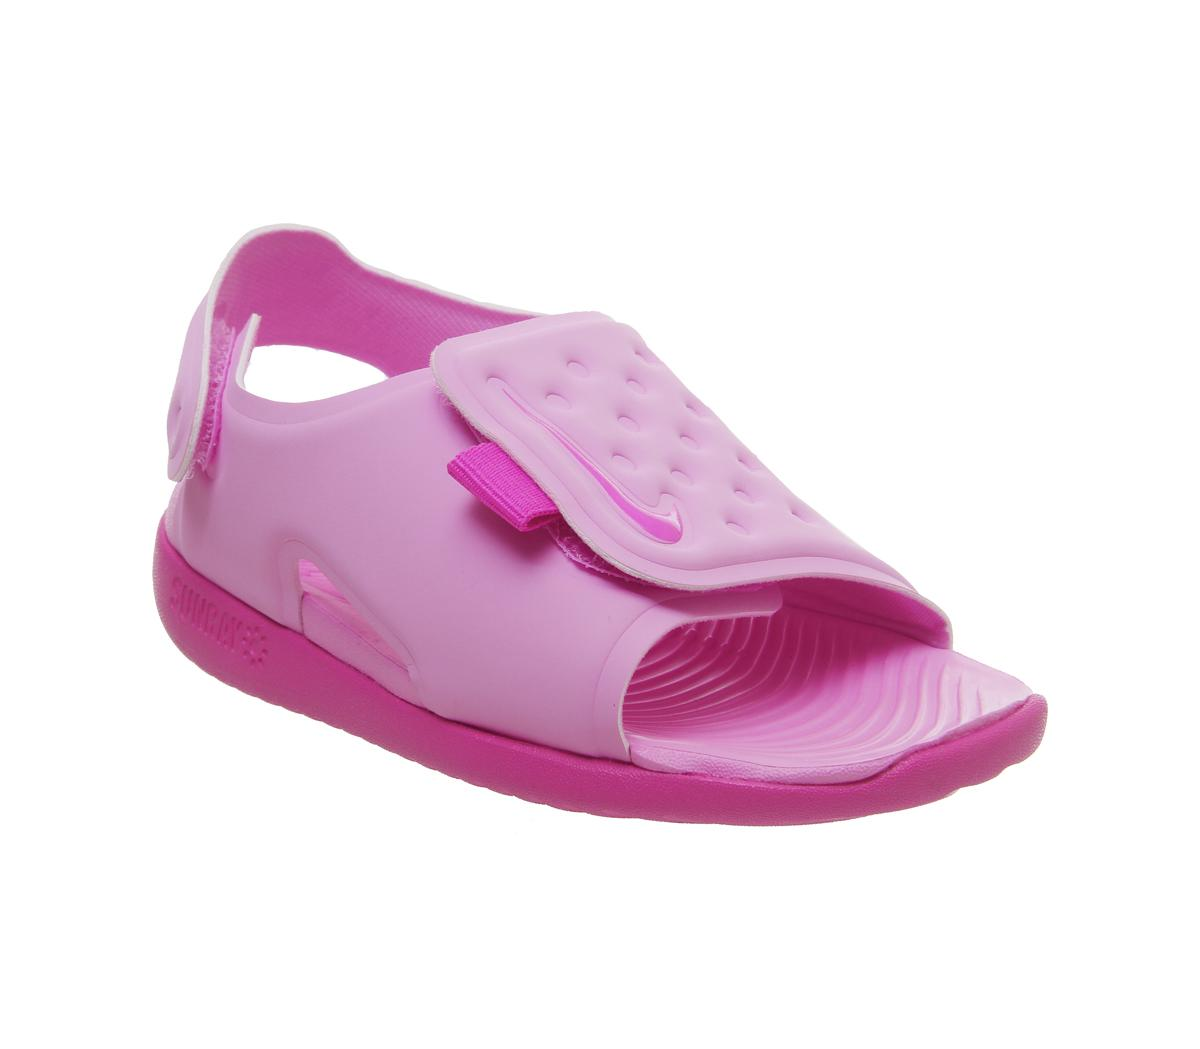 Nike Sunray Td Sandals